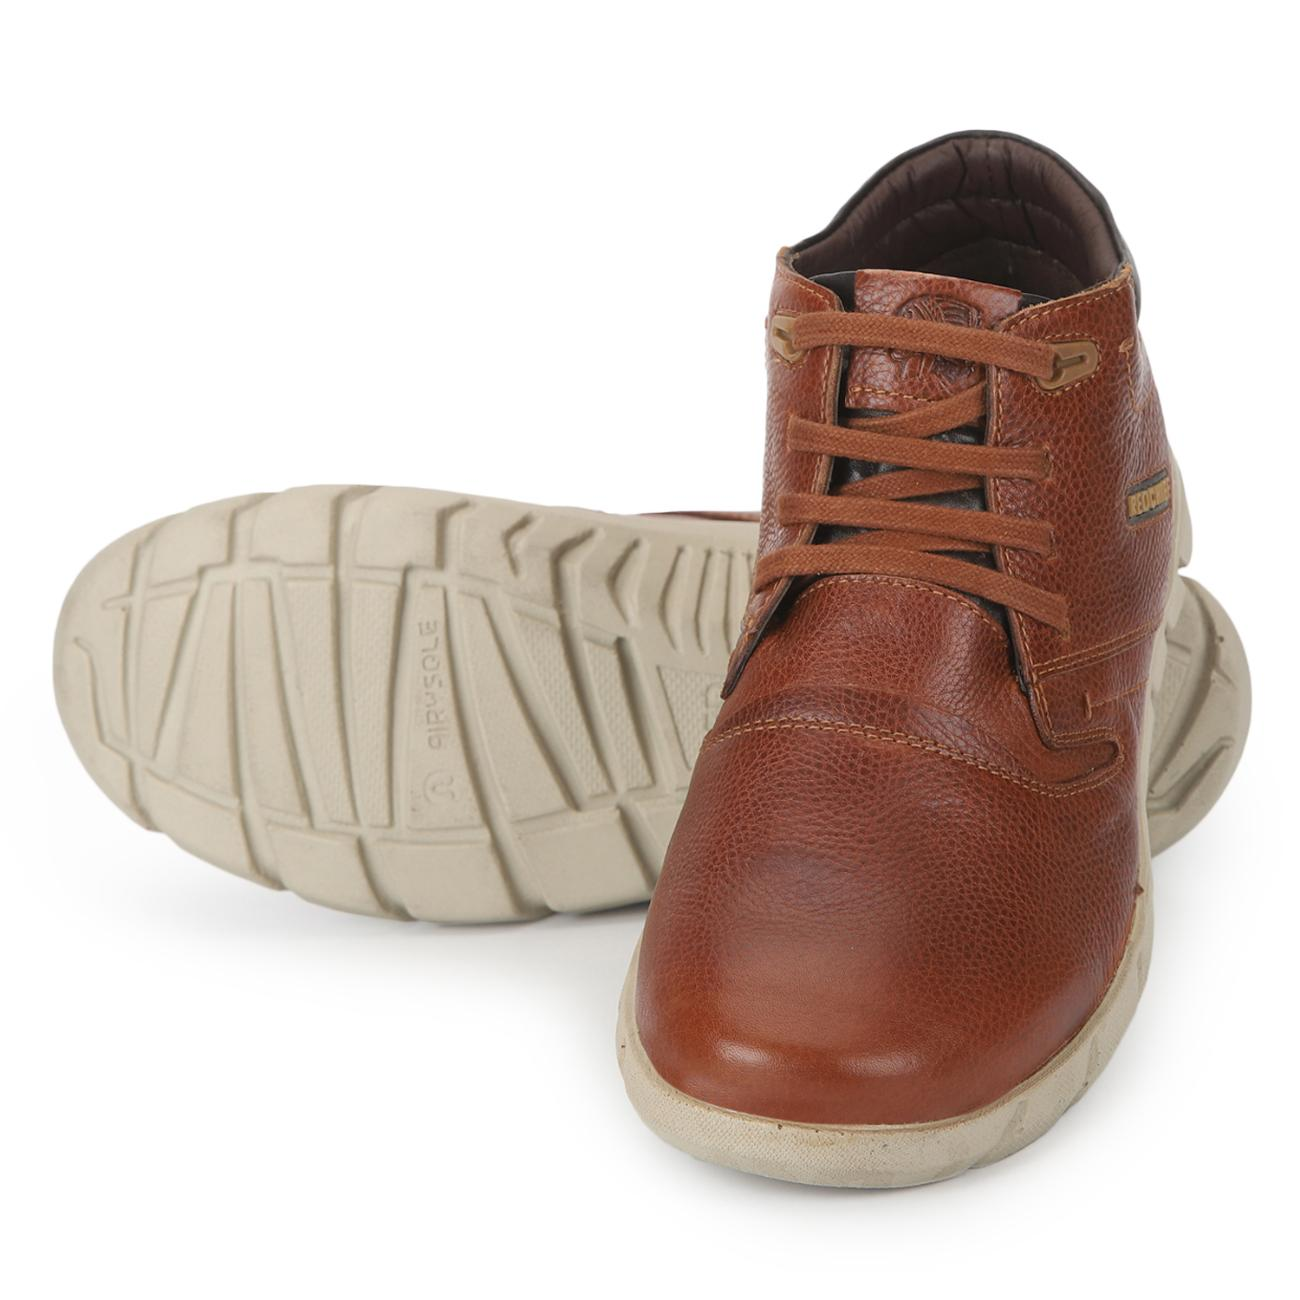 tan original casual derby shoes